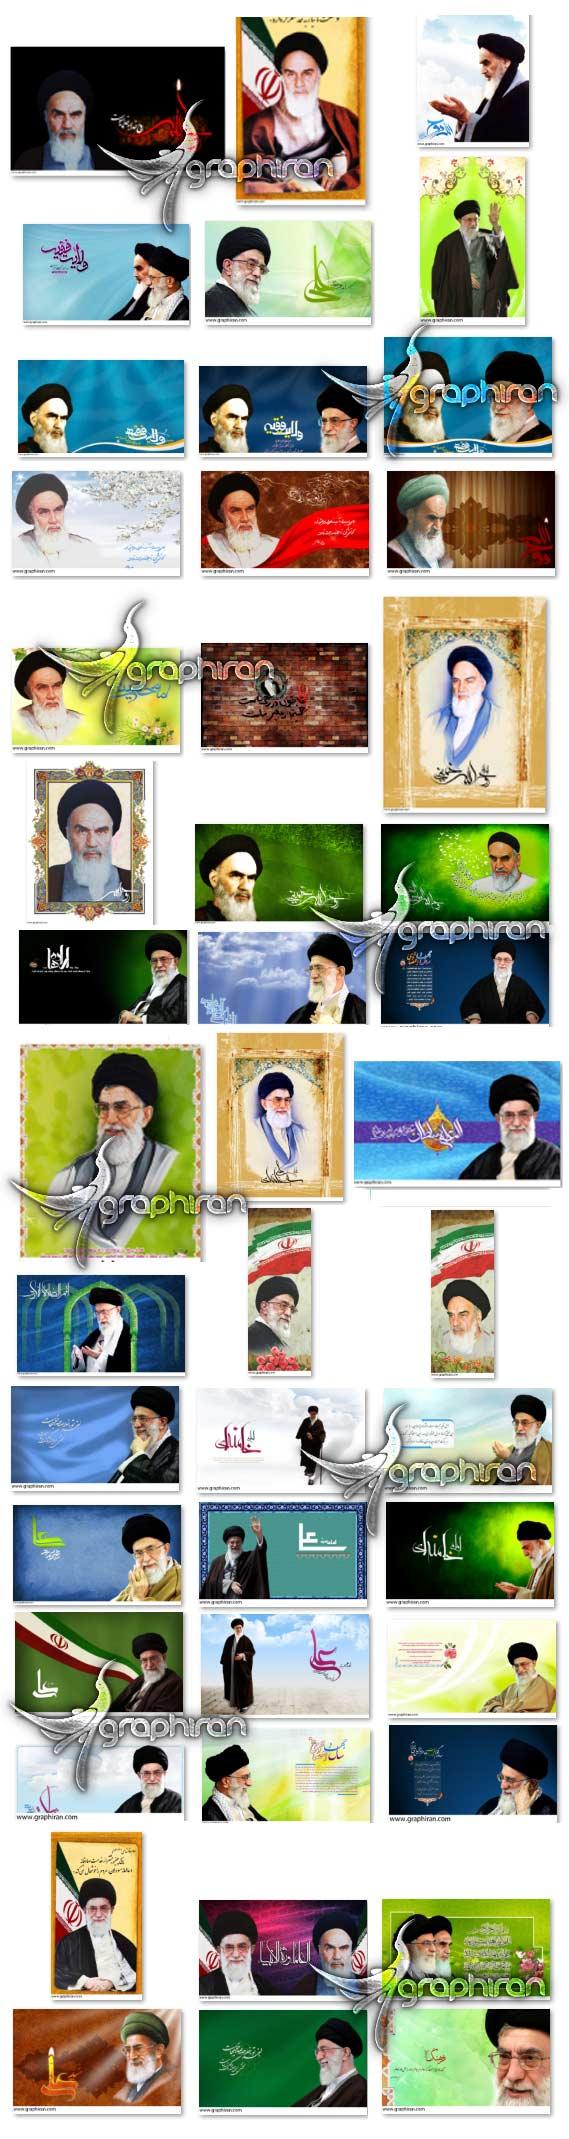 خرید بنر و پوستر امام خمینی (ره) و مقام رهبری